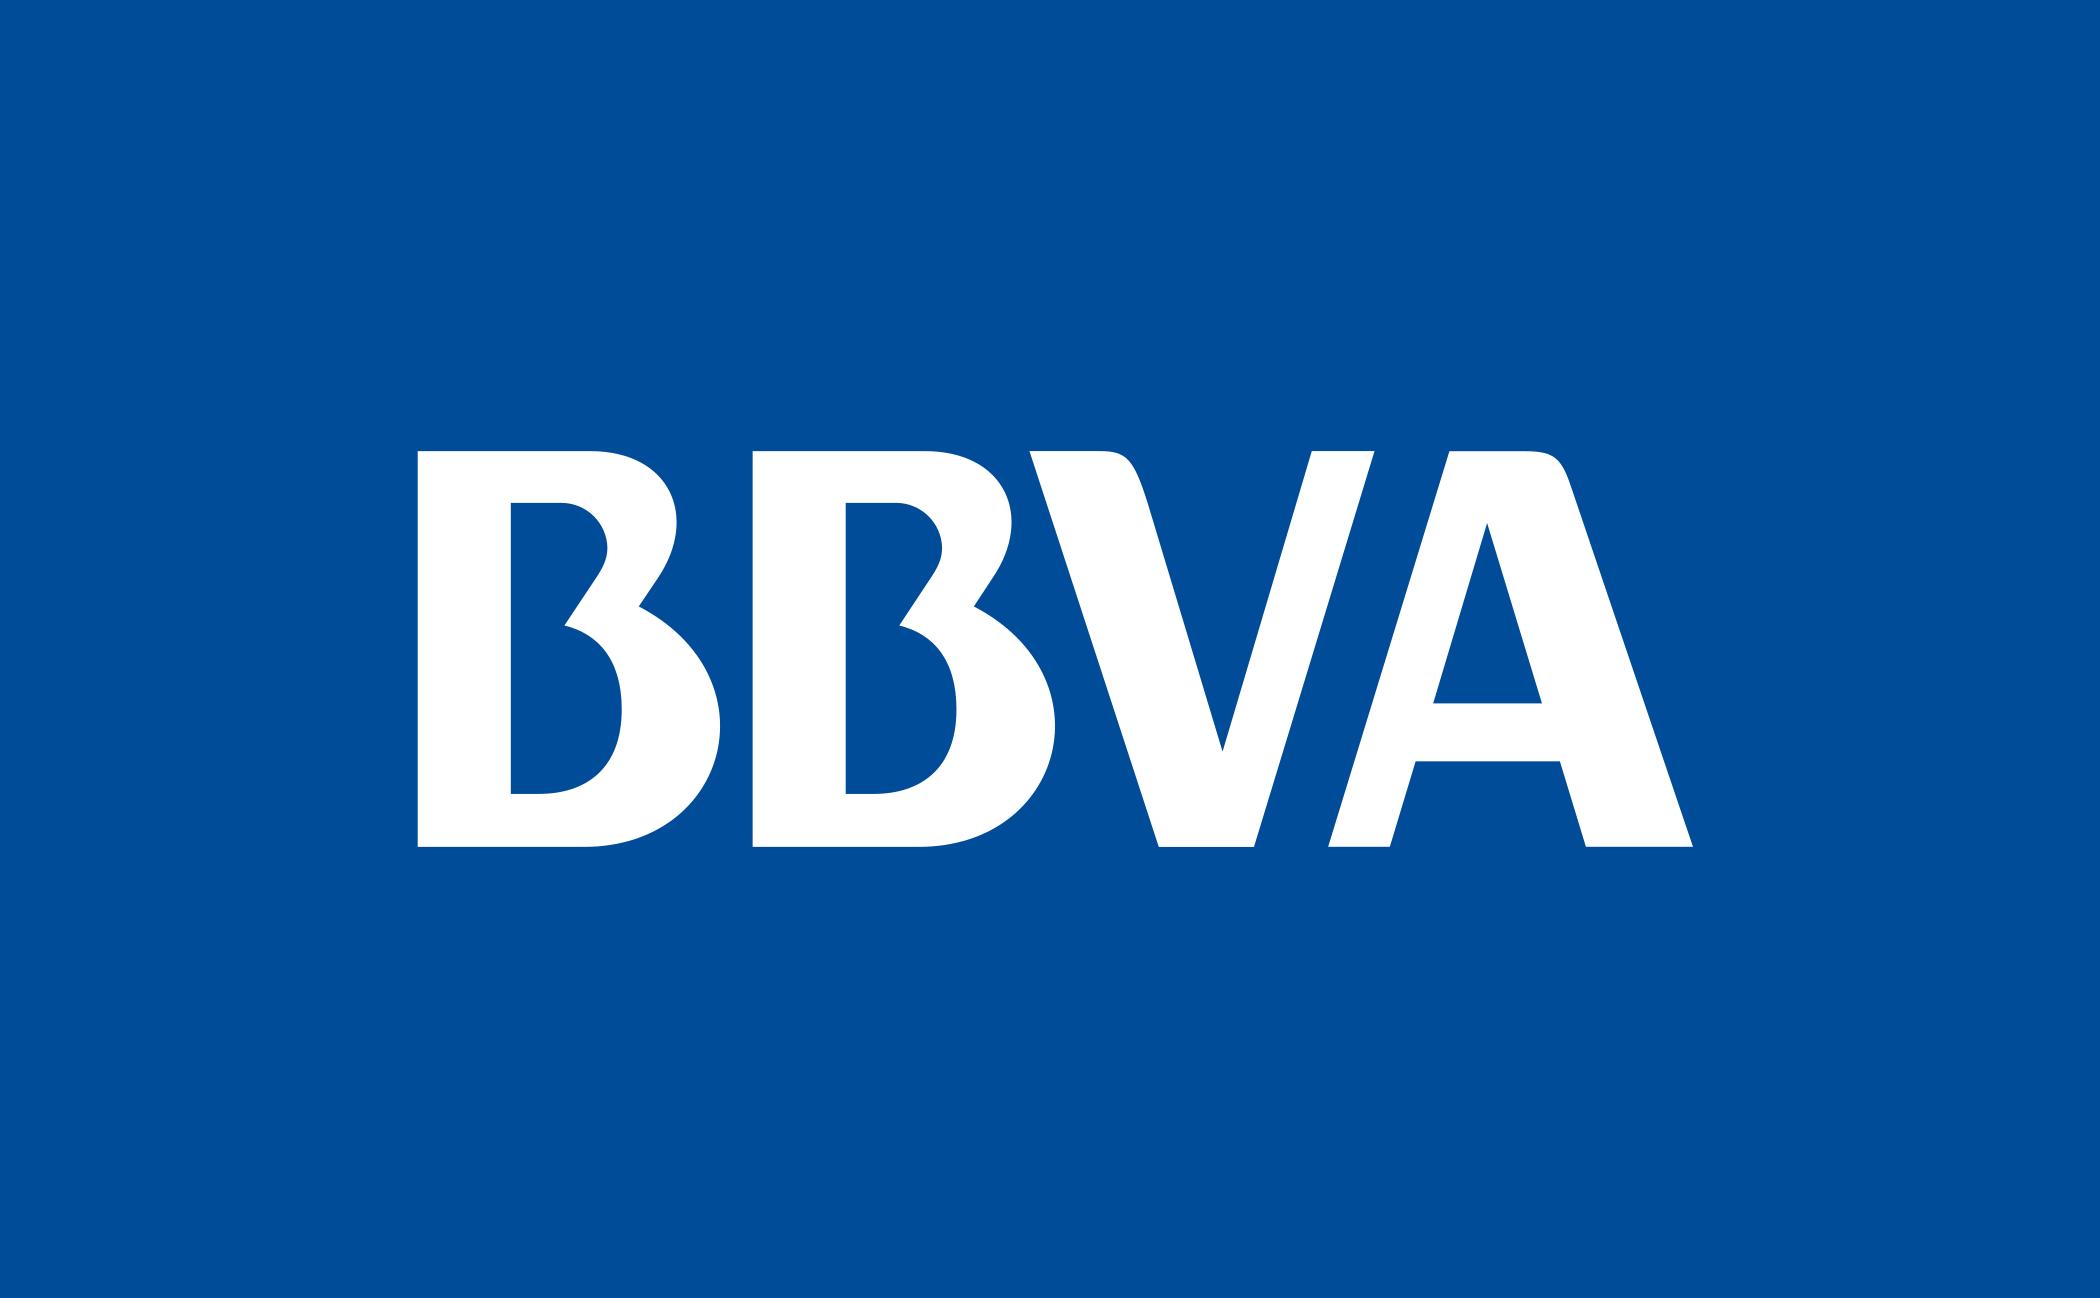 BBVA Logo.